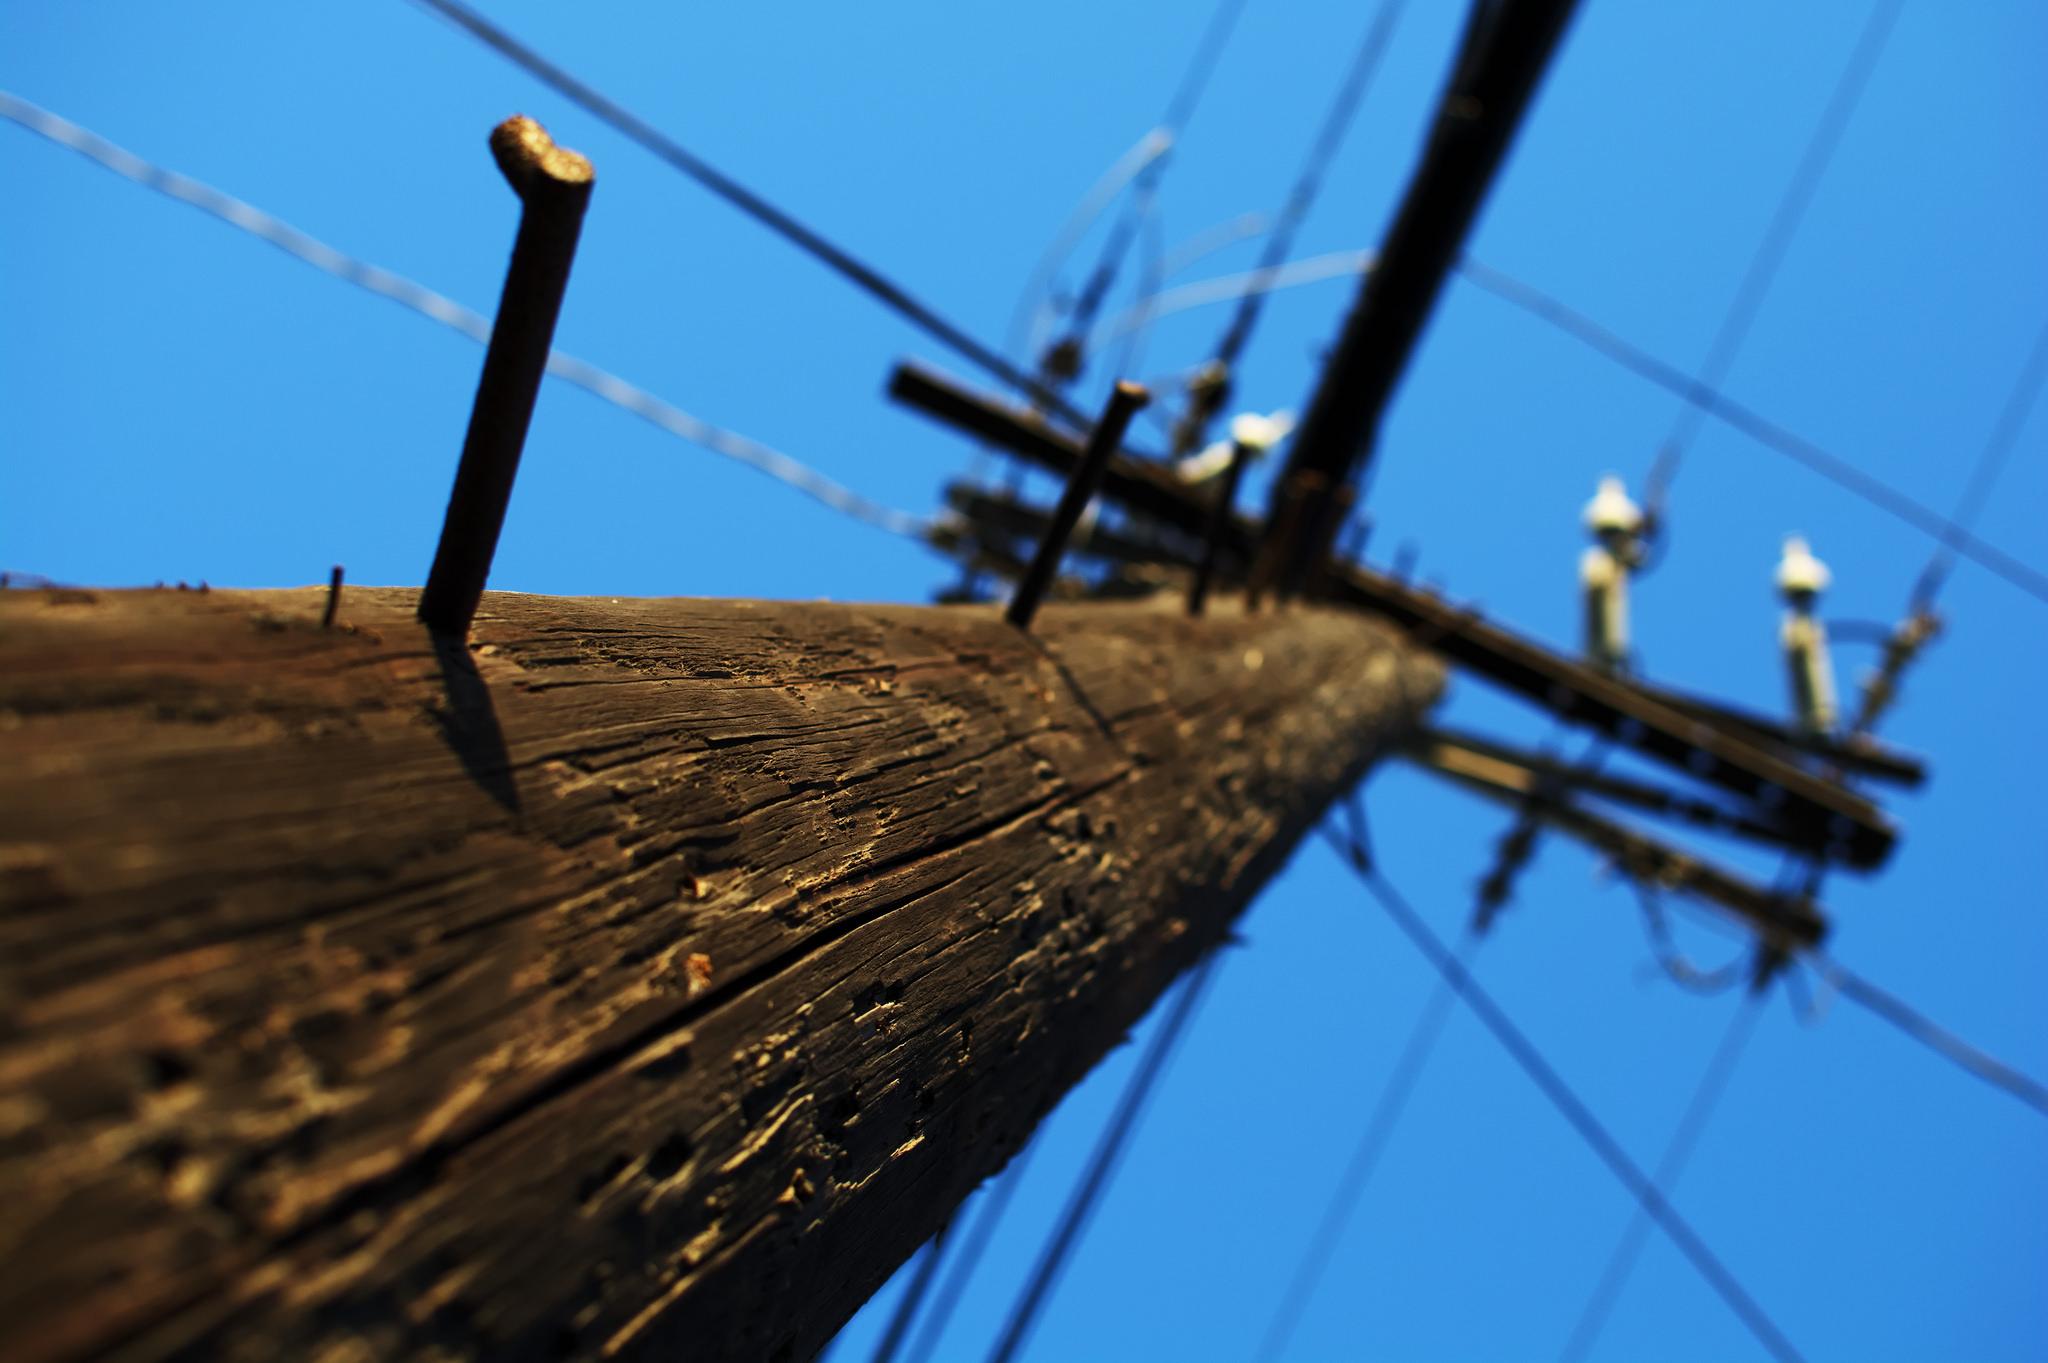 Utility Pole (Credit: Maëlick/Flickr)